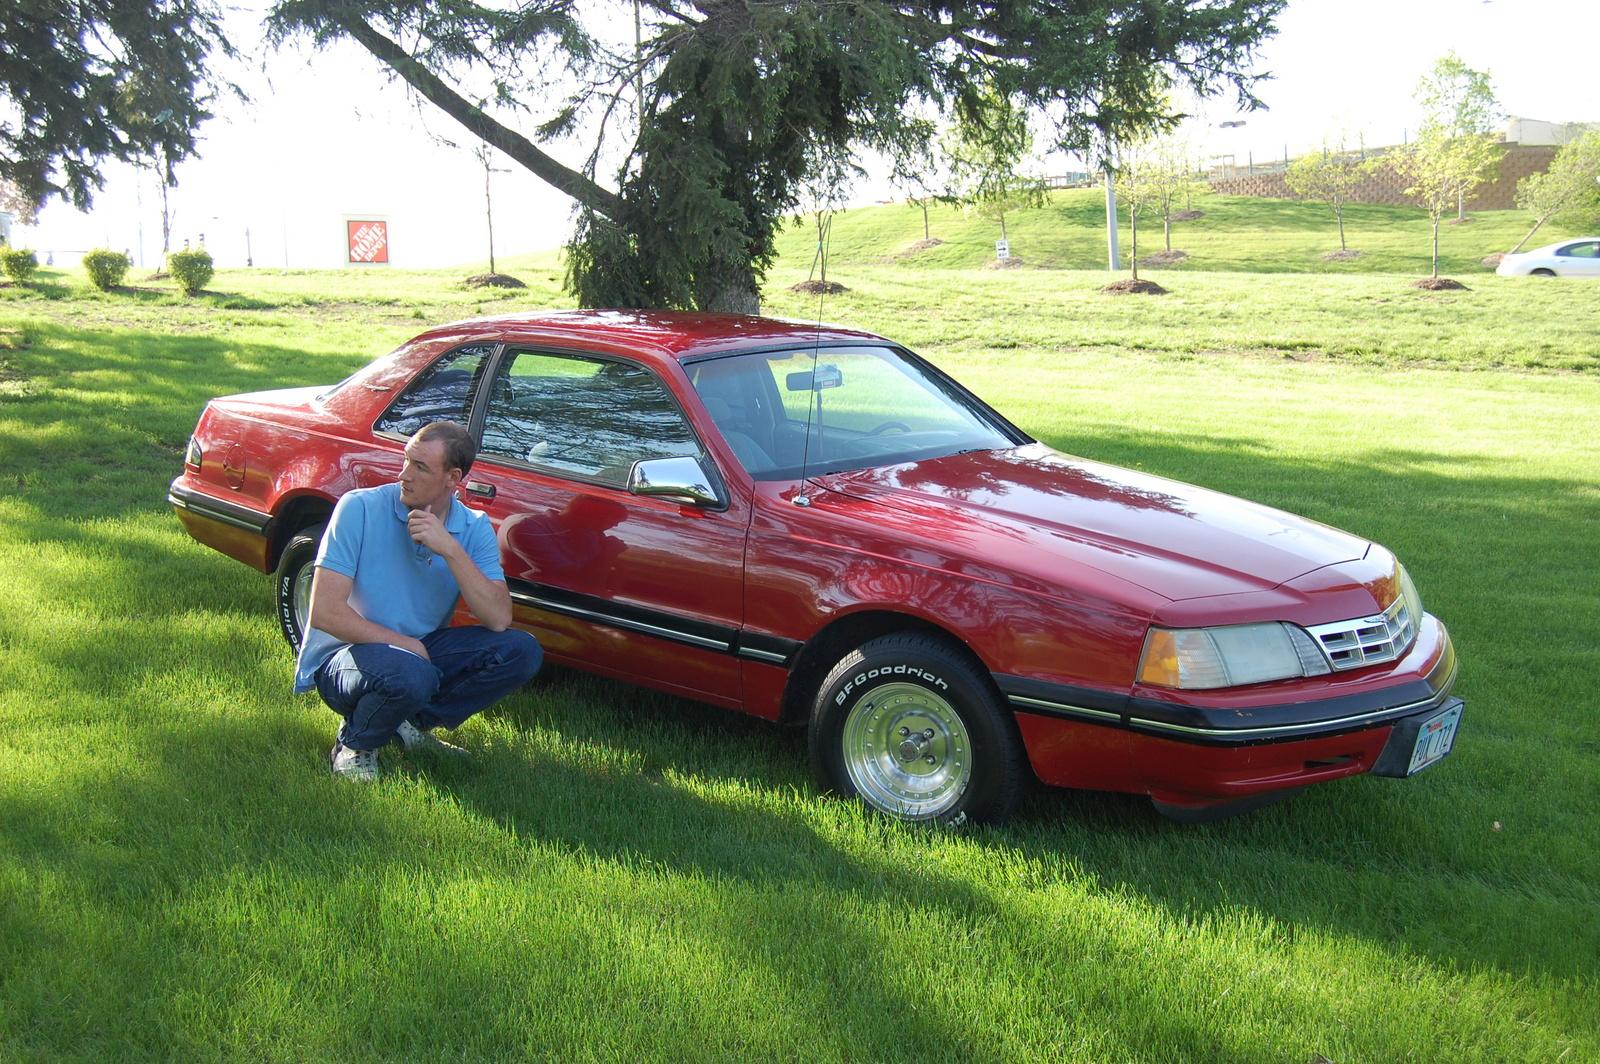 1987 Ford Thunderbird - Pictures - CarGurus